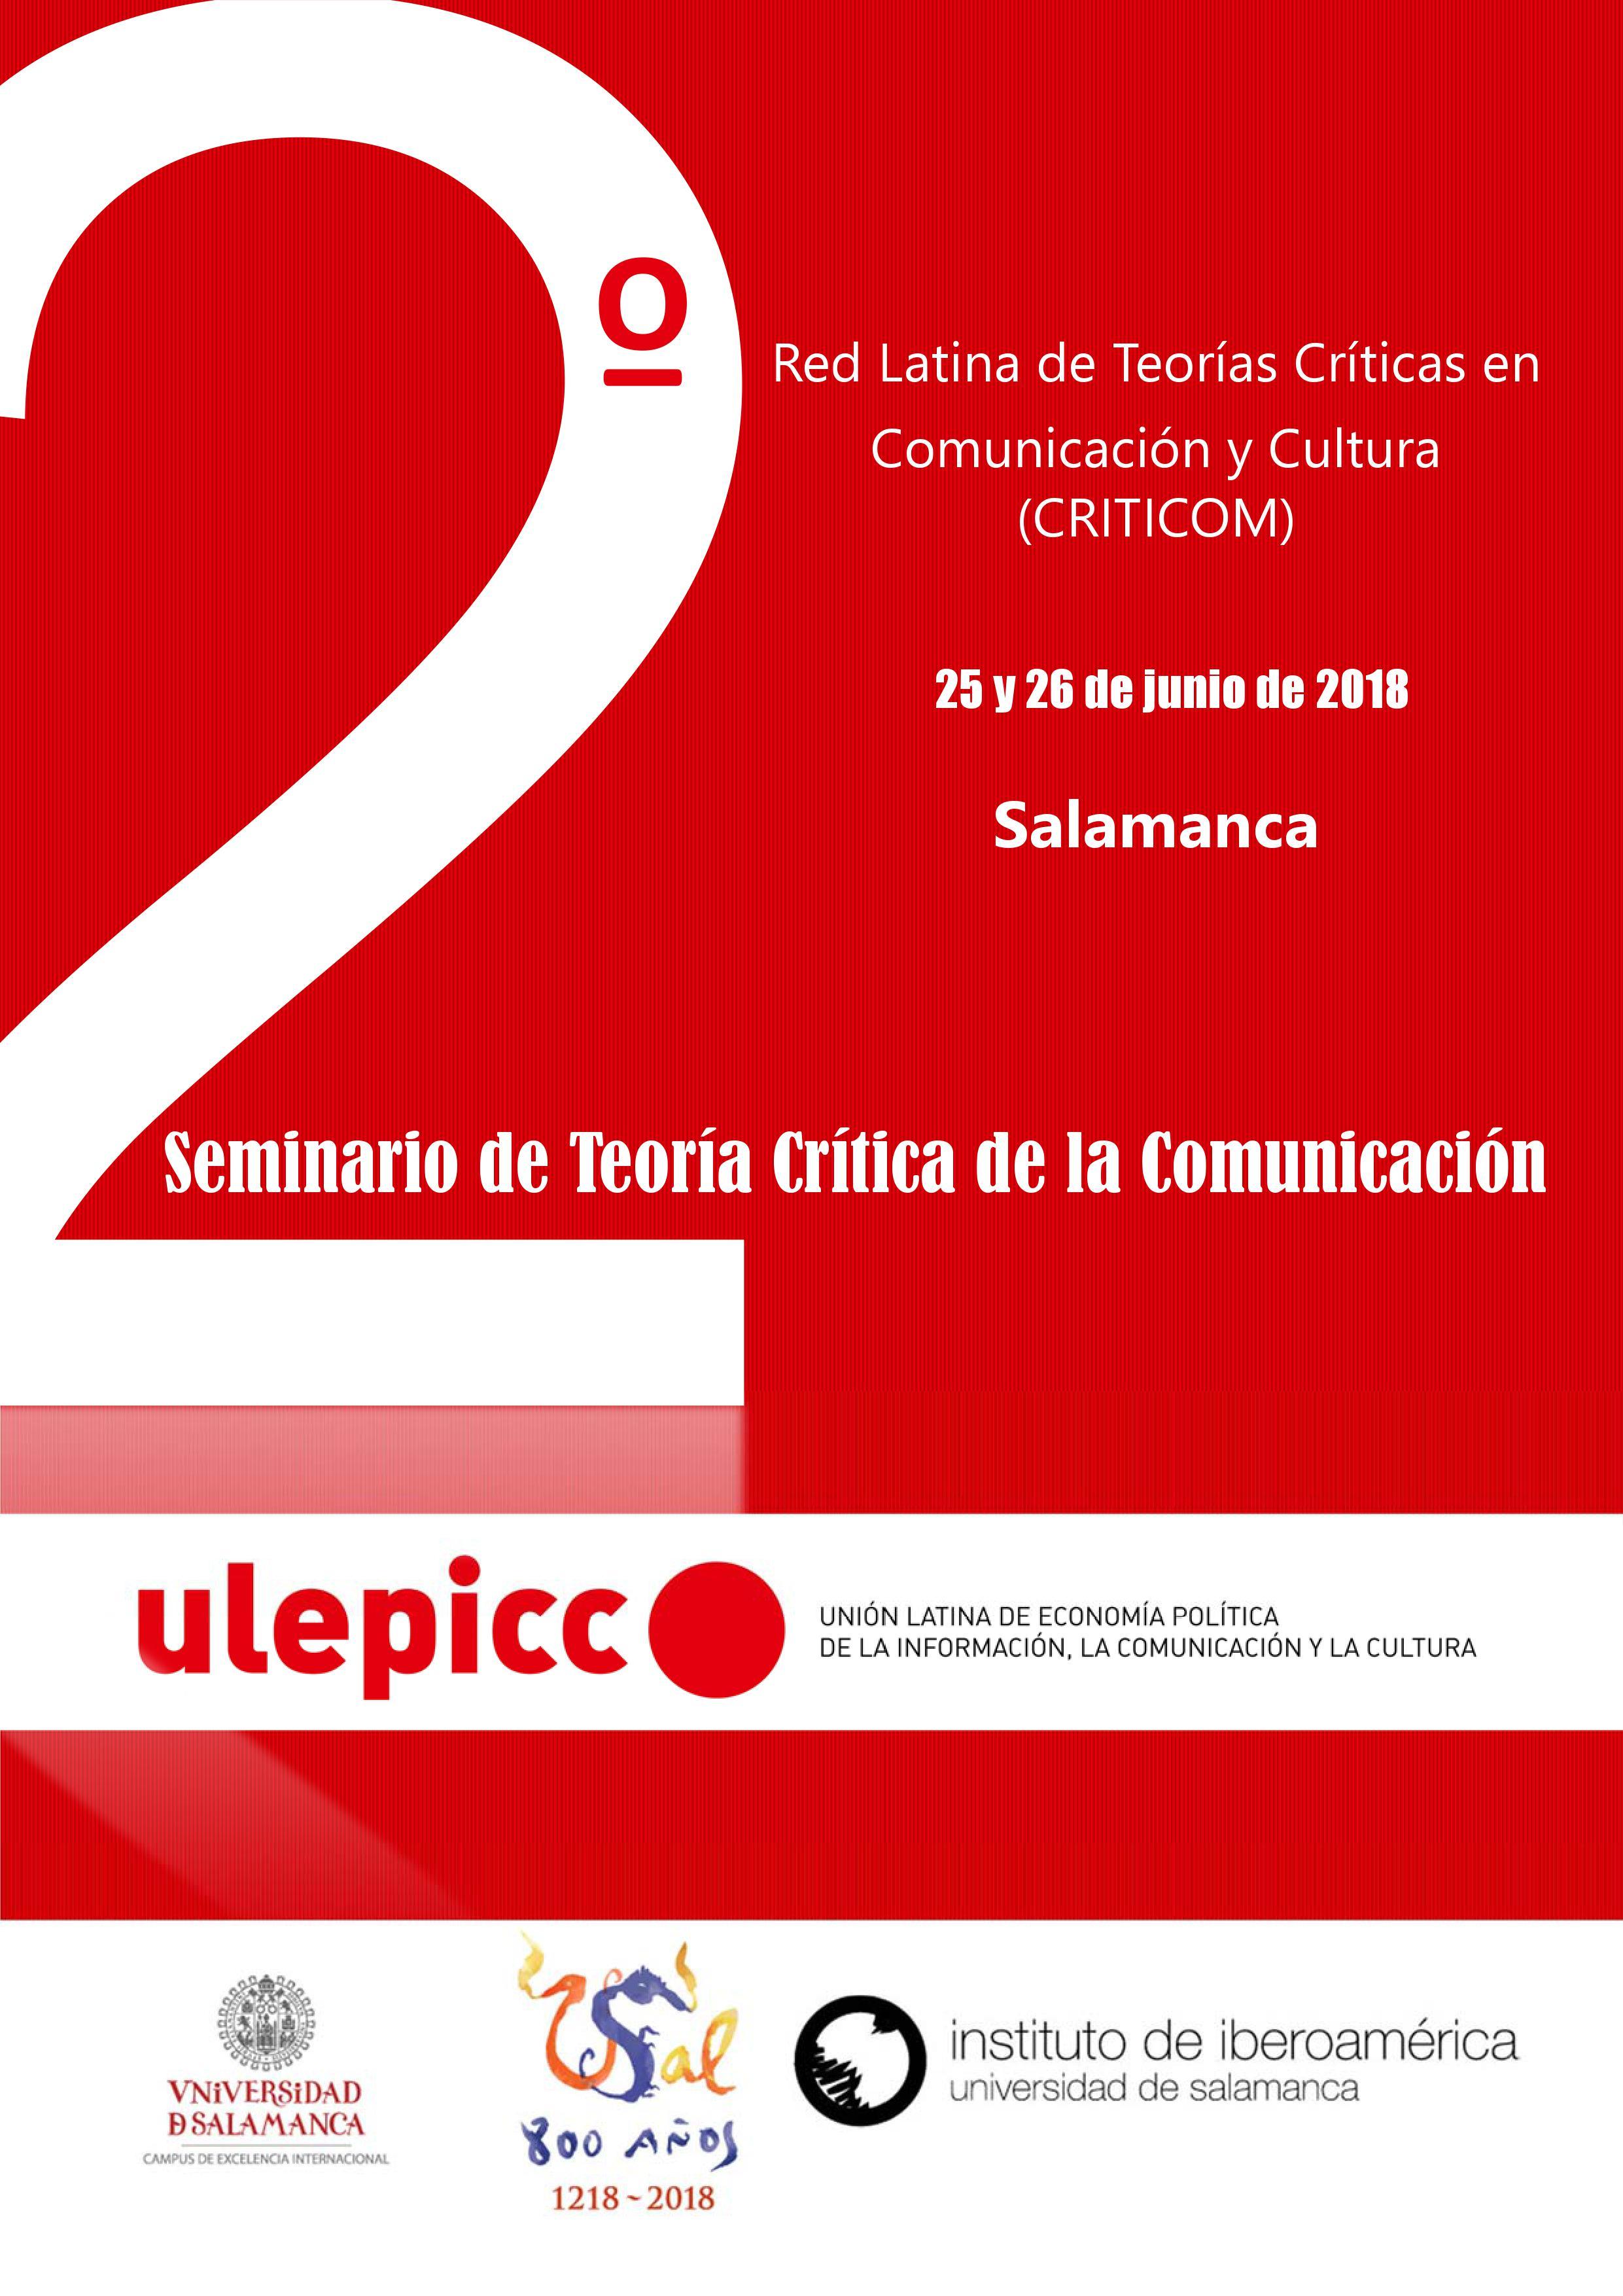 Seminario Internacional Teoría Crítica